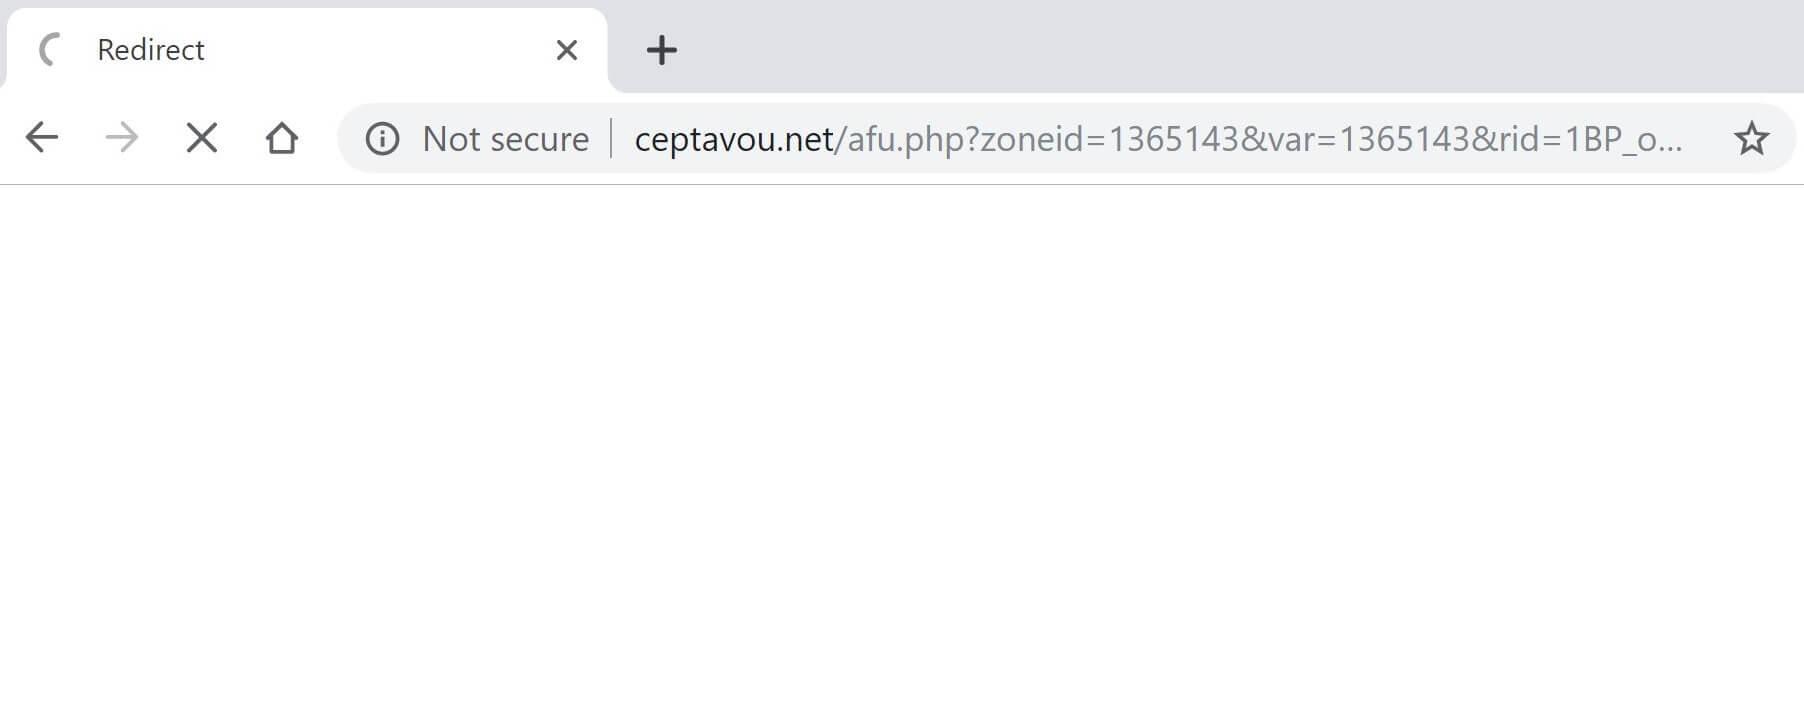 stf-ceptavou.net